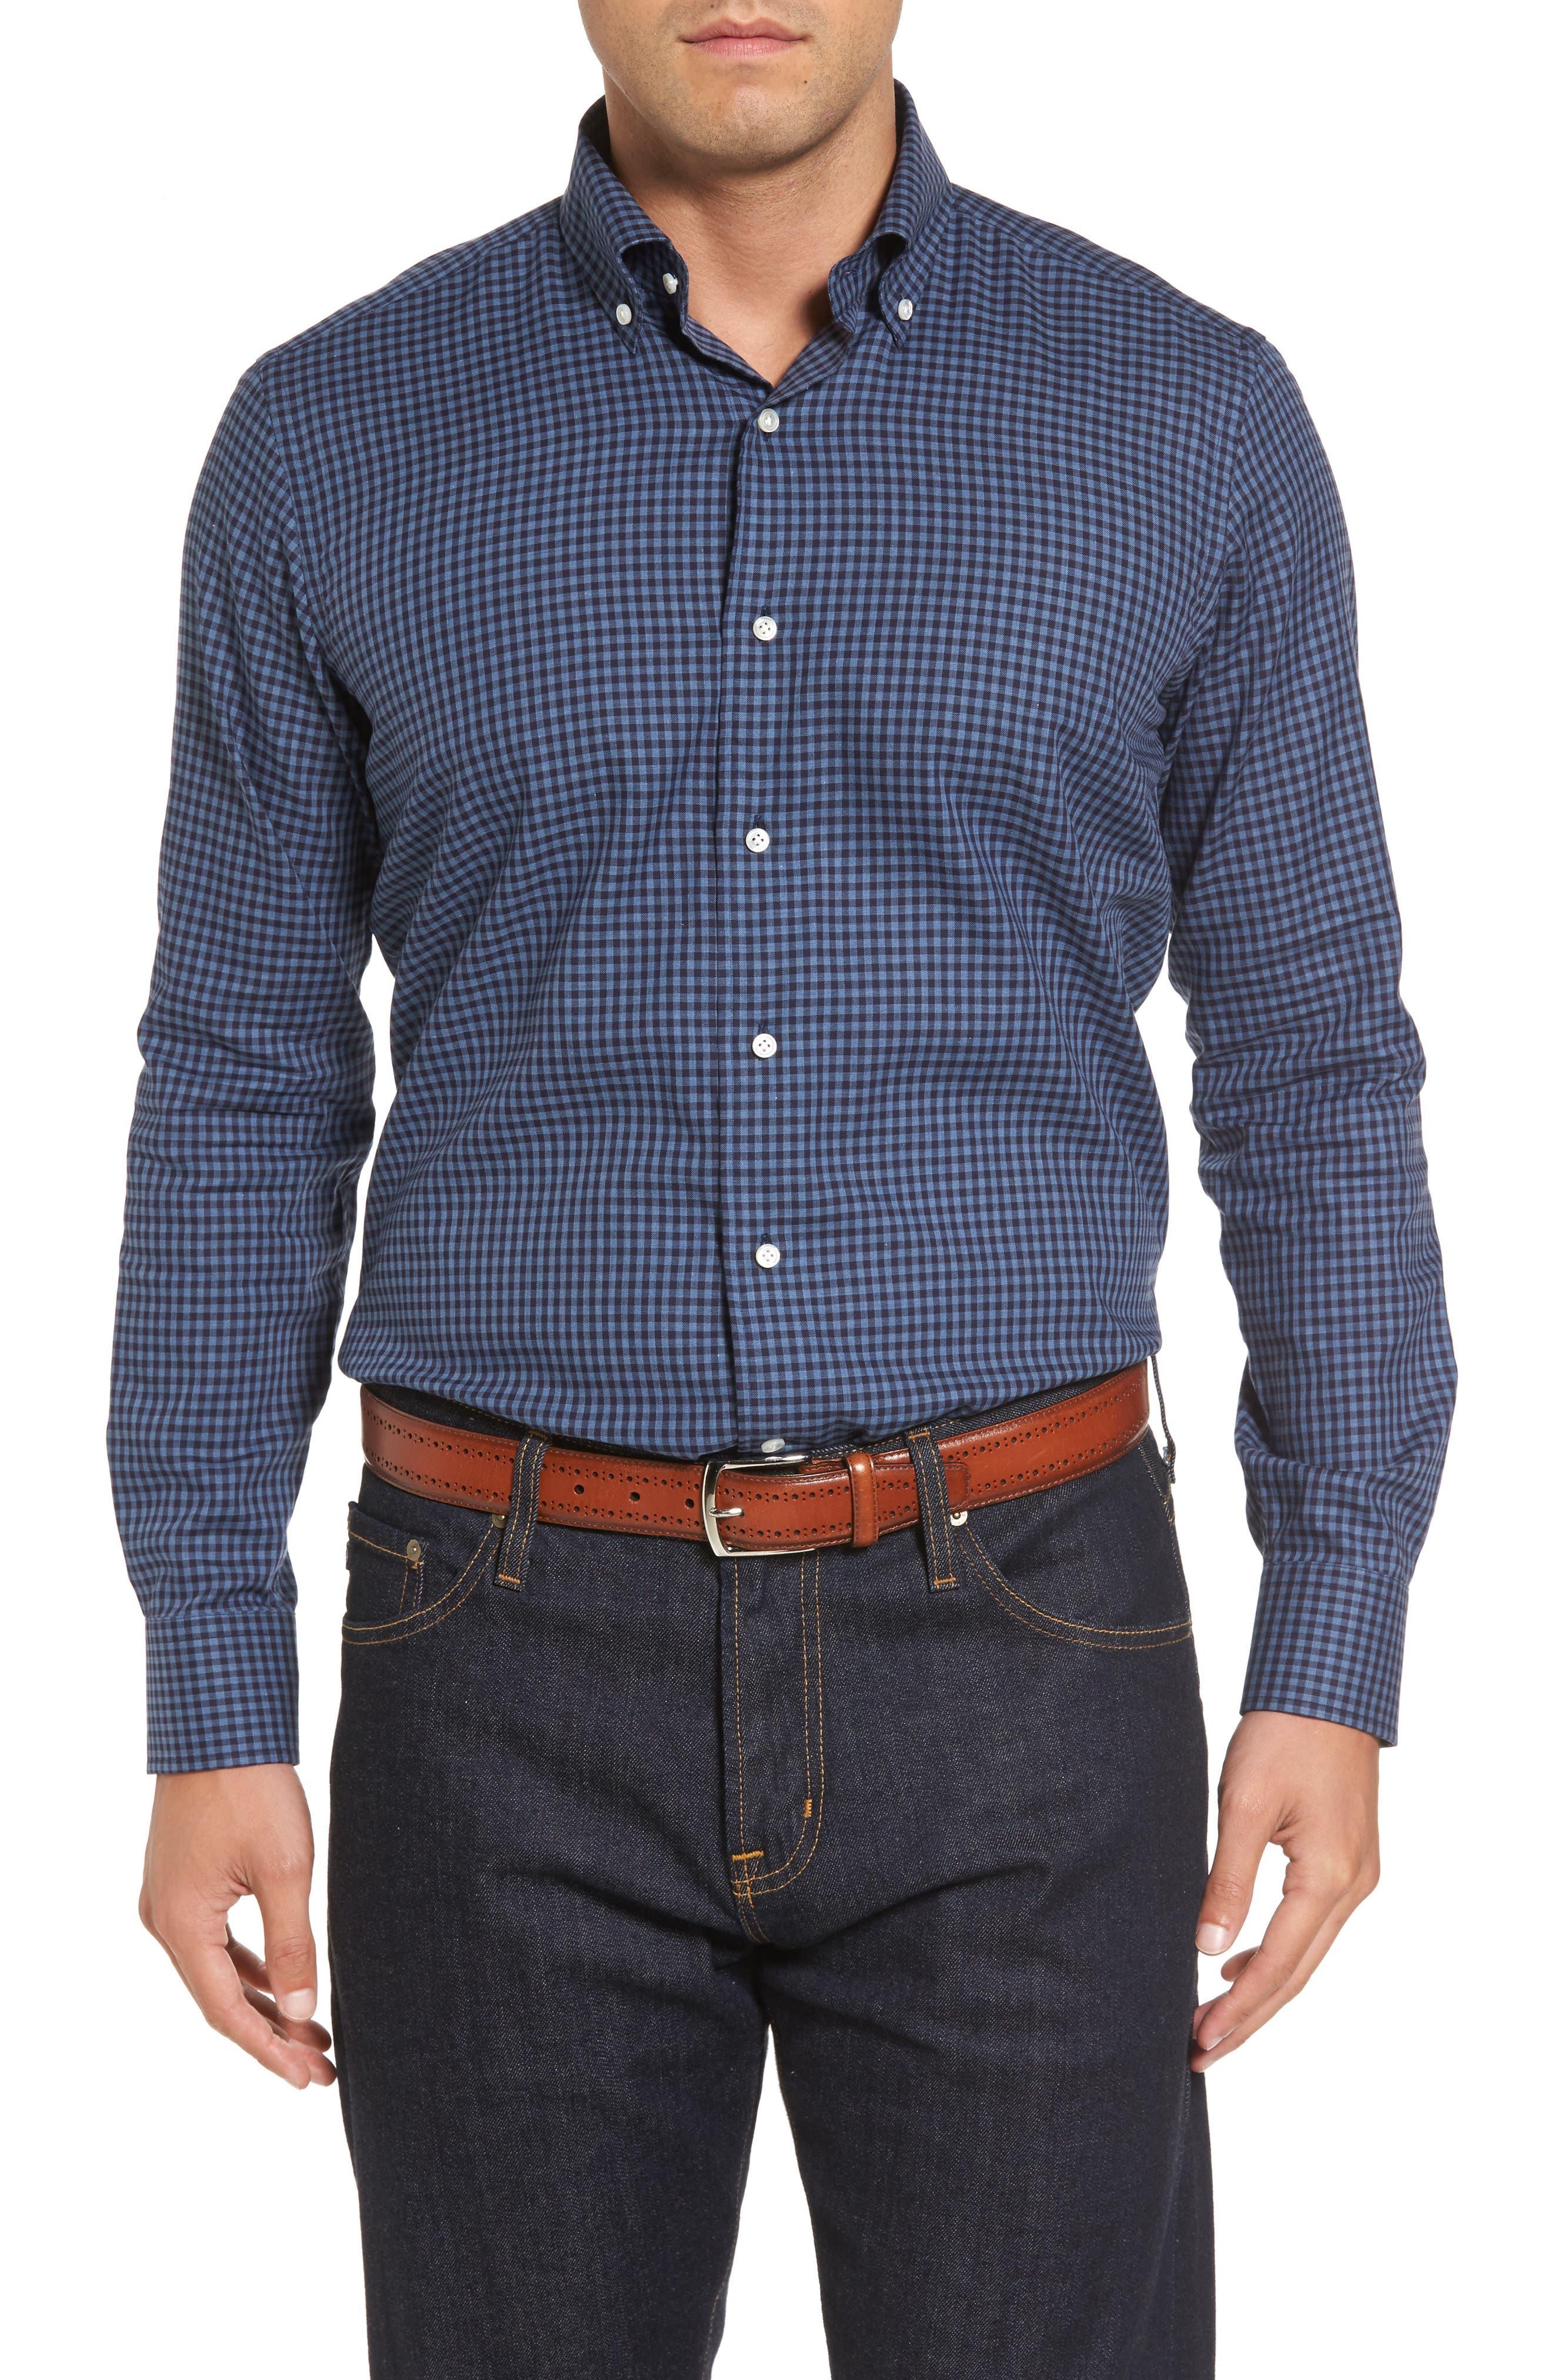 Main Image - Peter Millar Caledonia Regular Fit Check Sport Shirt